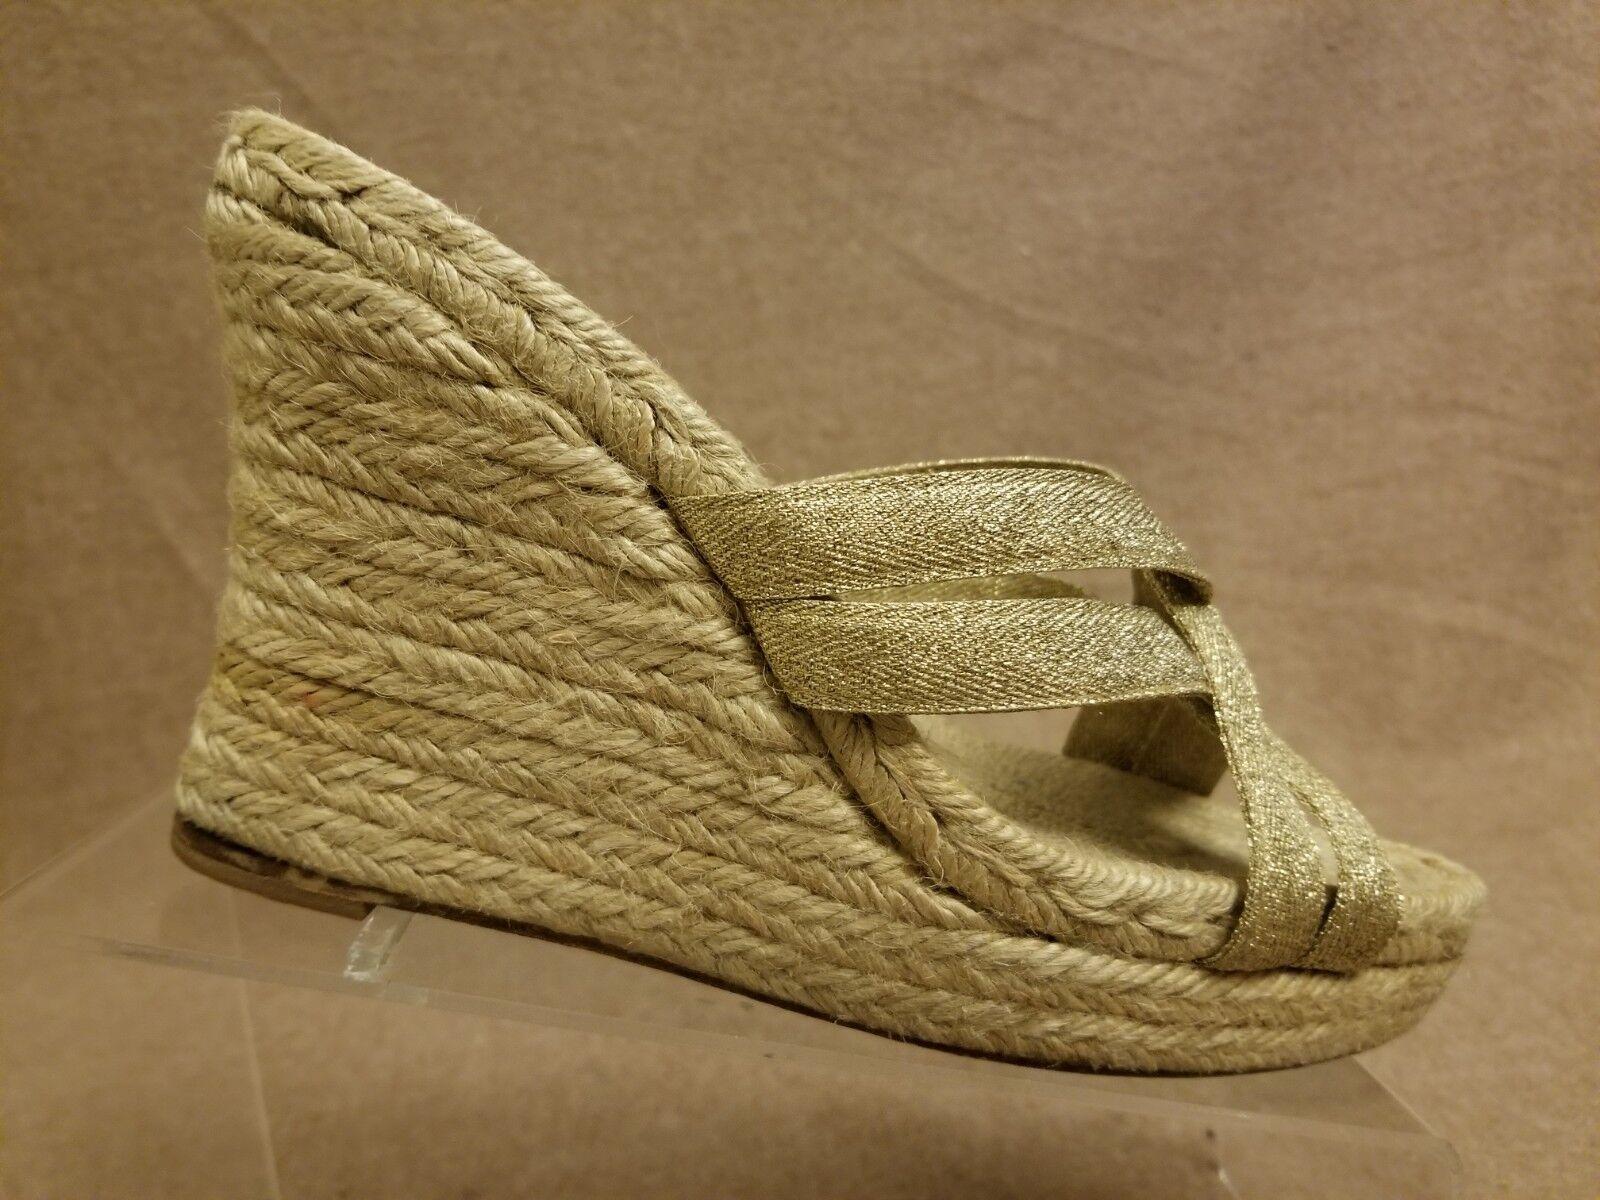 vendite online Stubbs & Wootton donna Espadrille Wedges Glitter oro Strap Strap Strap Slides Sandals Sz 39  Offriamo vari marchi famosi